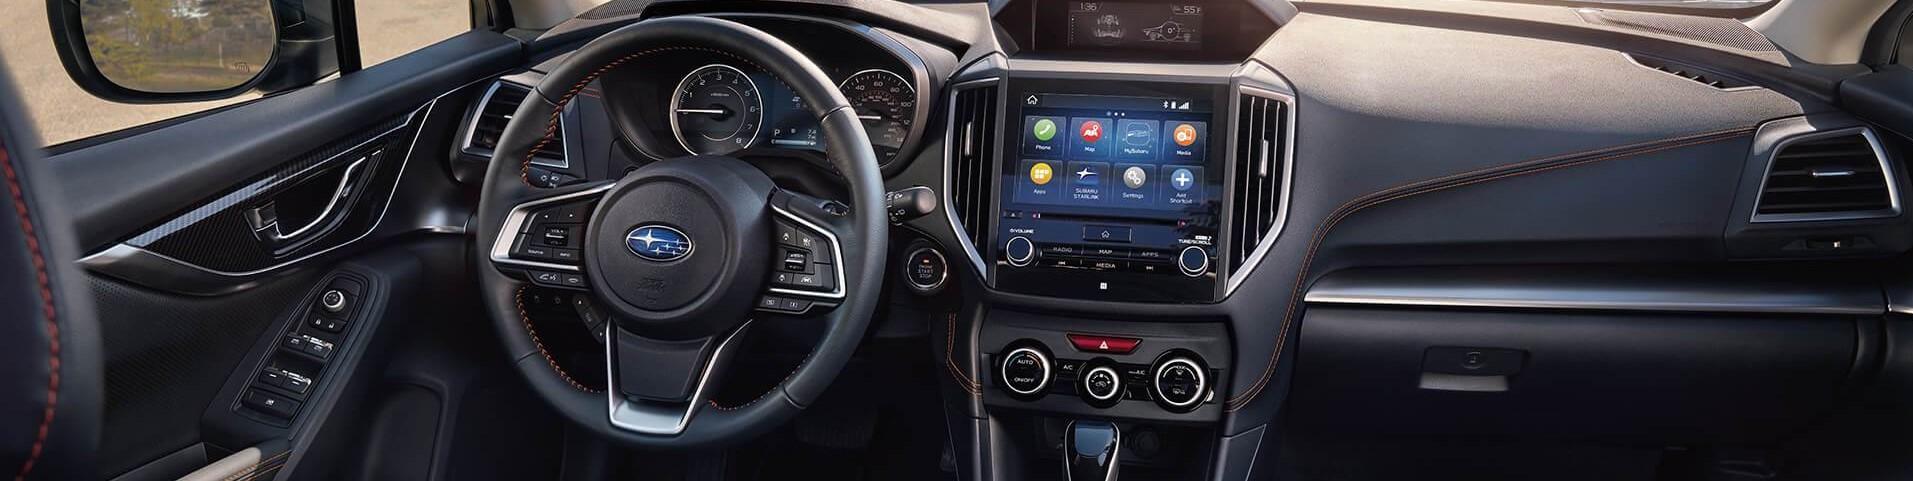 2020-Subaru-Crosstrek-Interior-With-Stitching